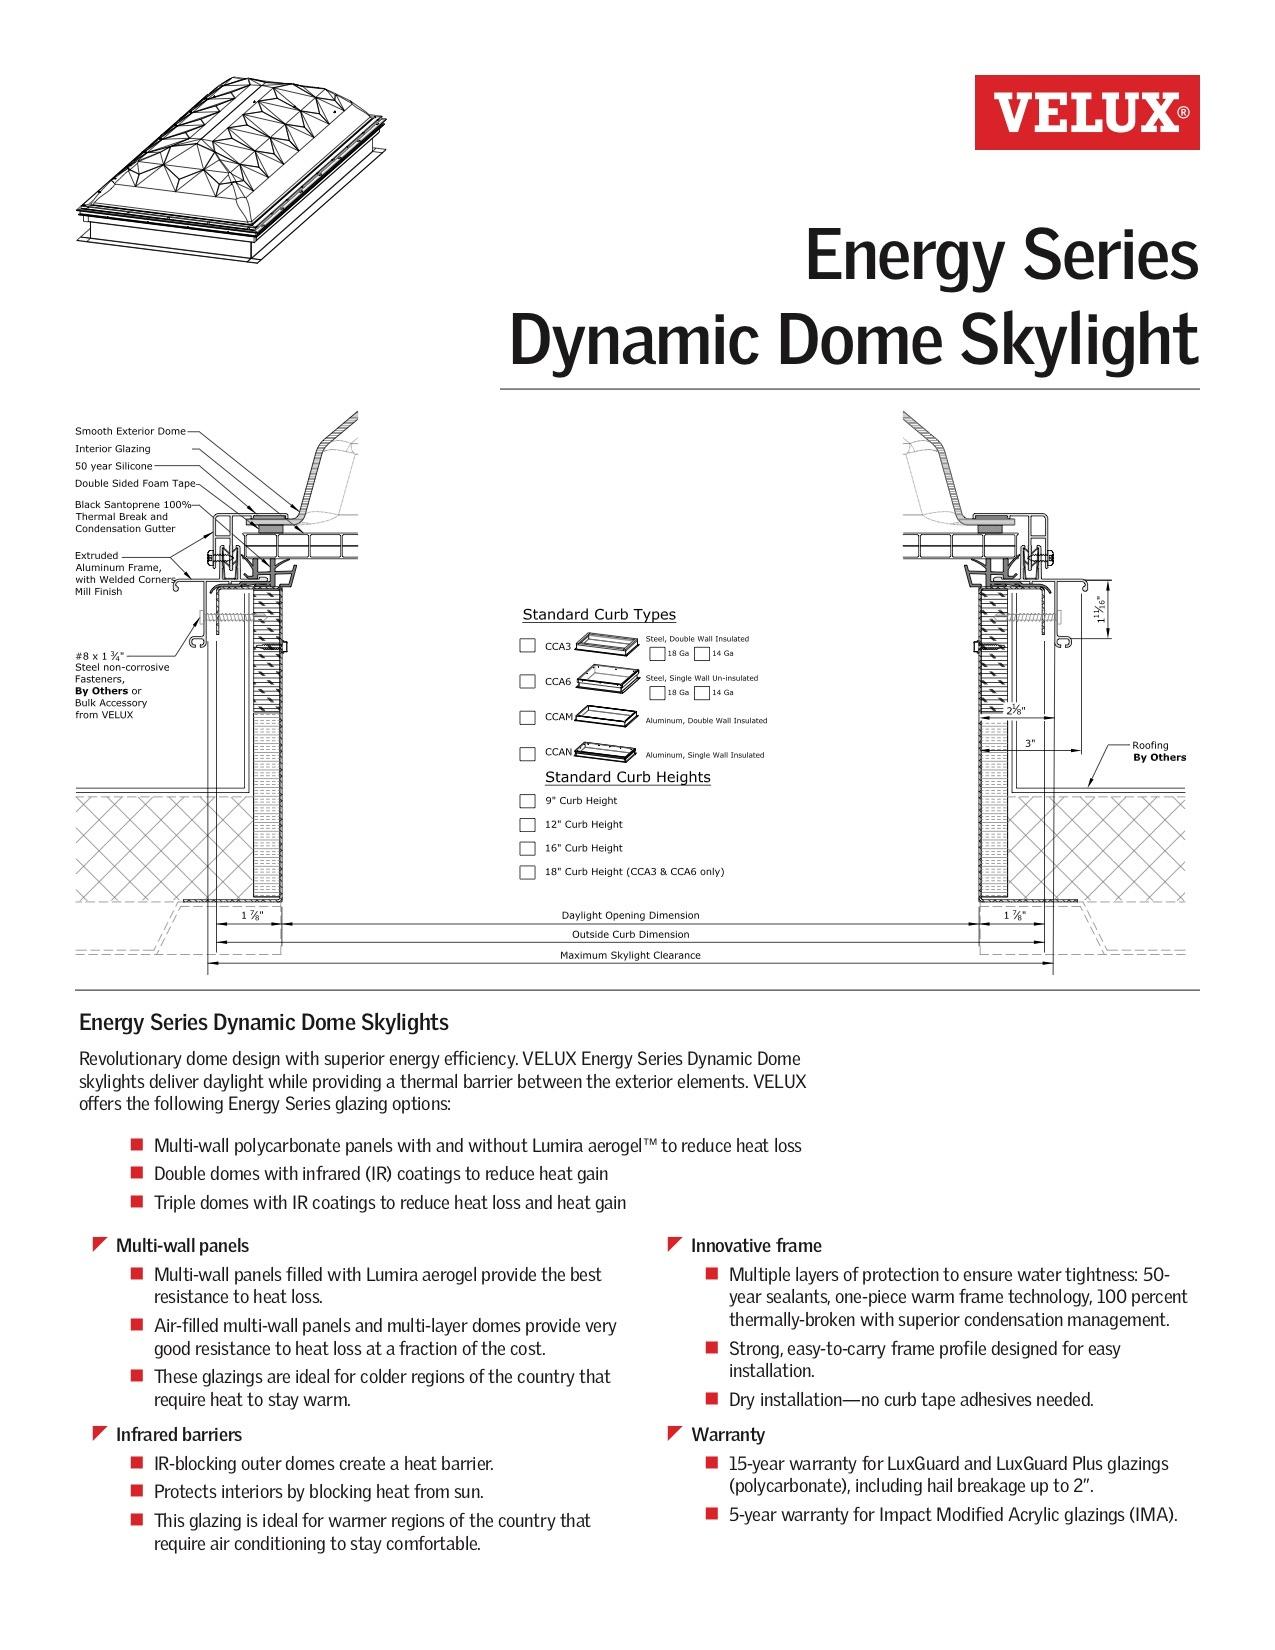 energyseries-dynamicdome